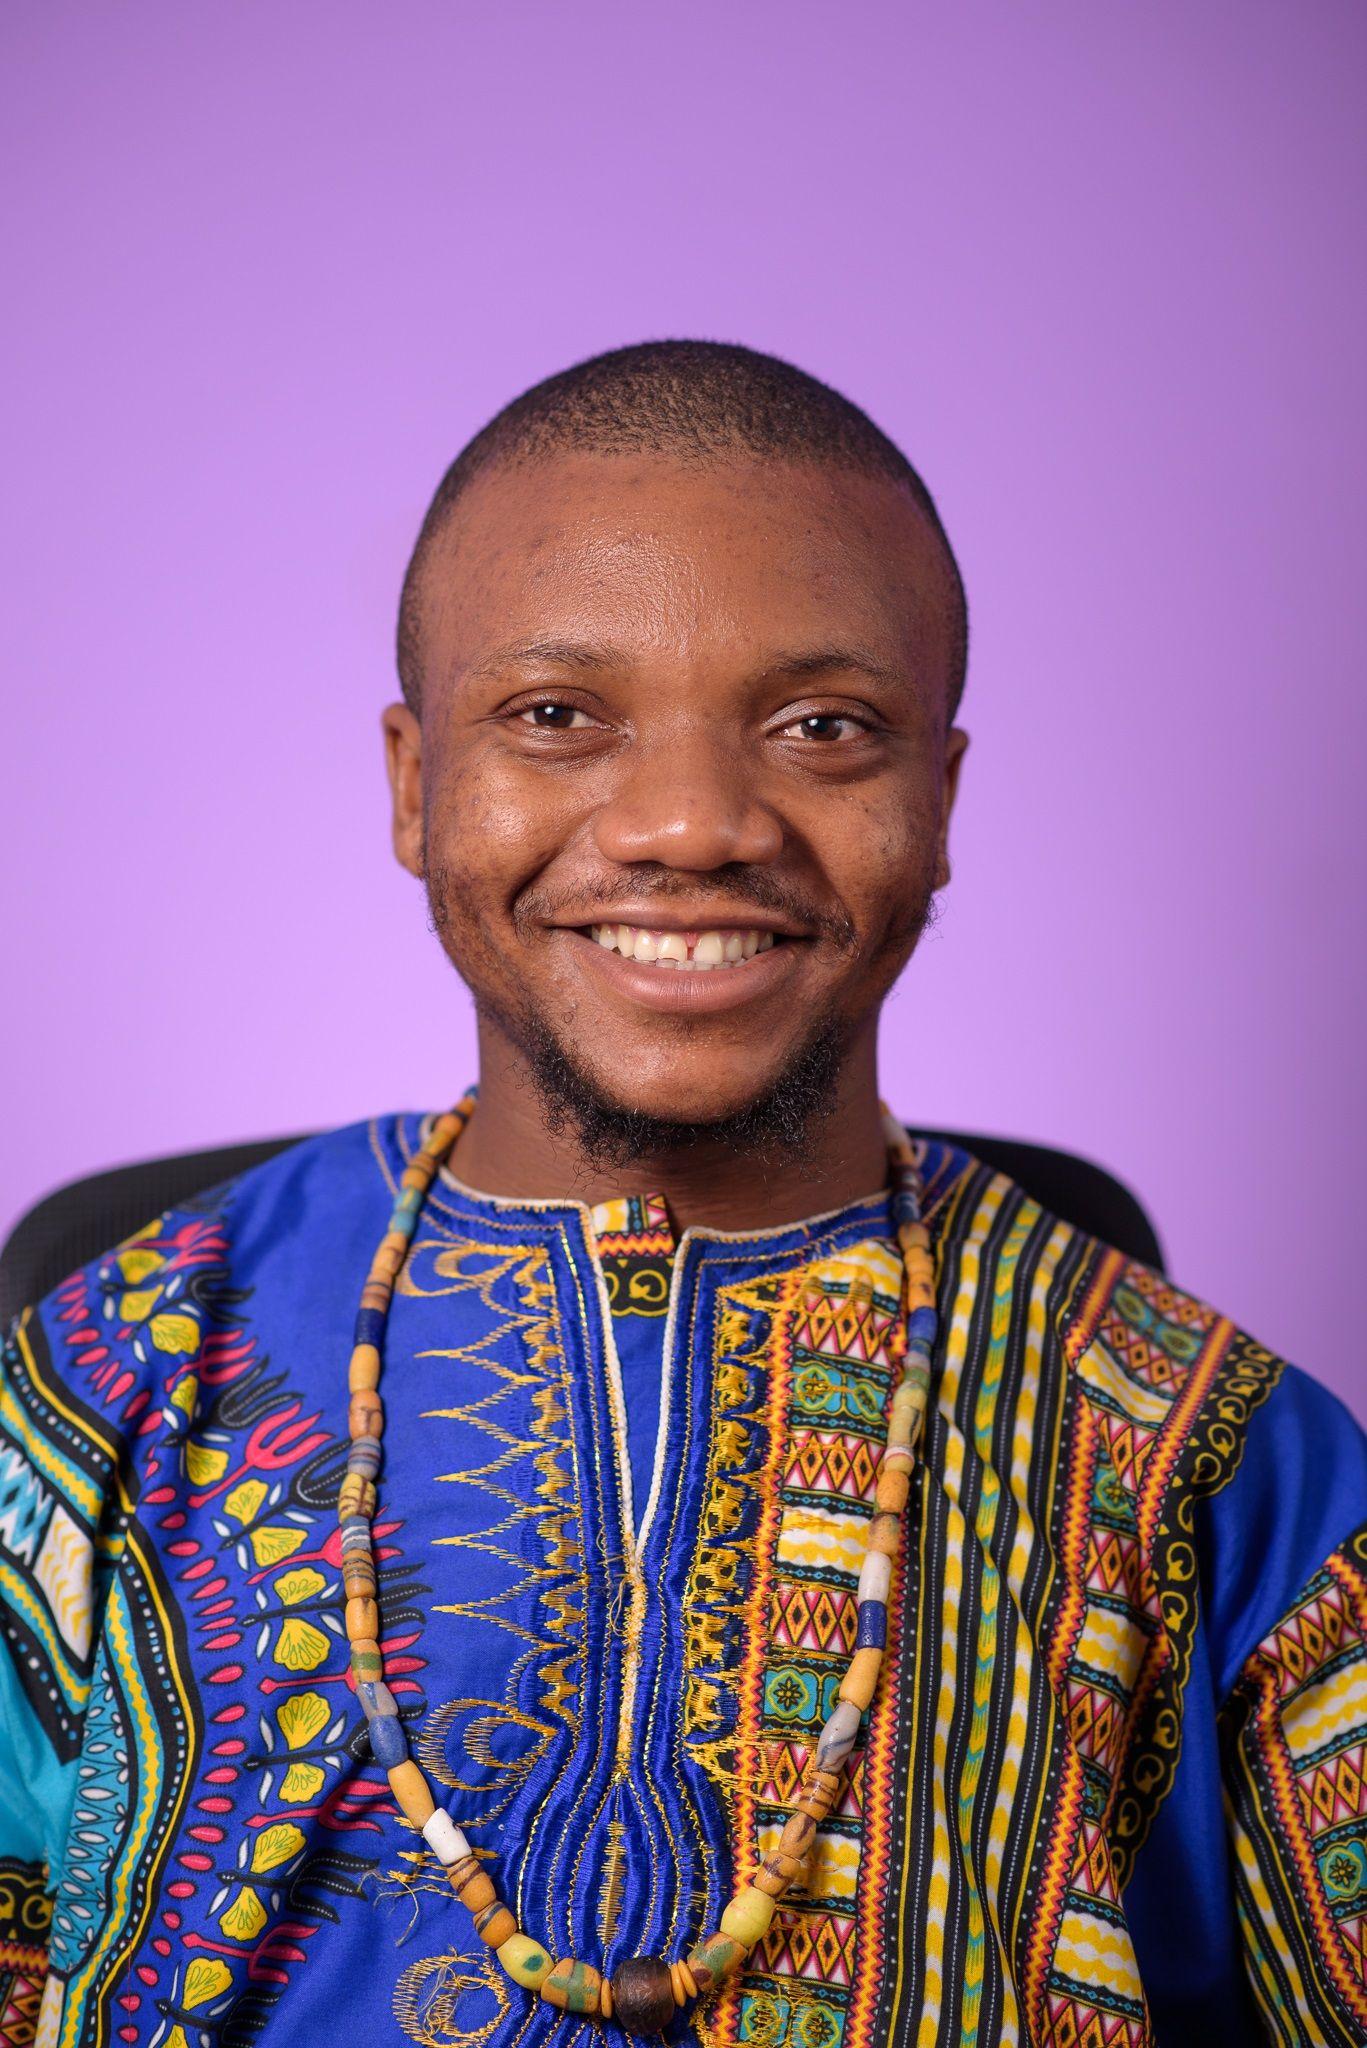 Ngnaoussi Elongue Cedric Christian